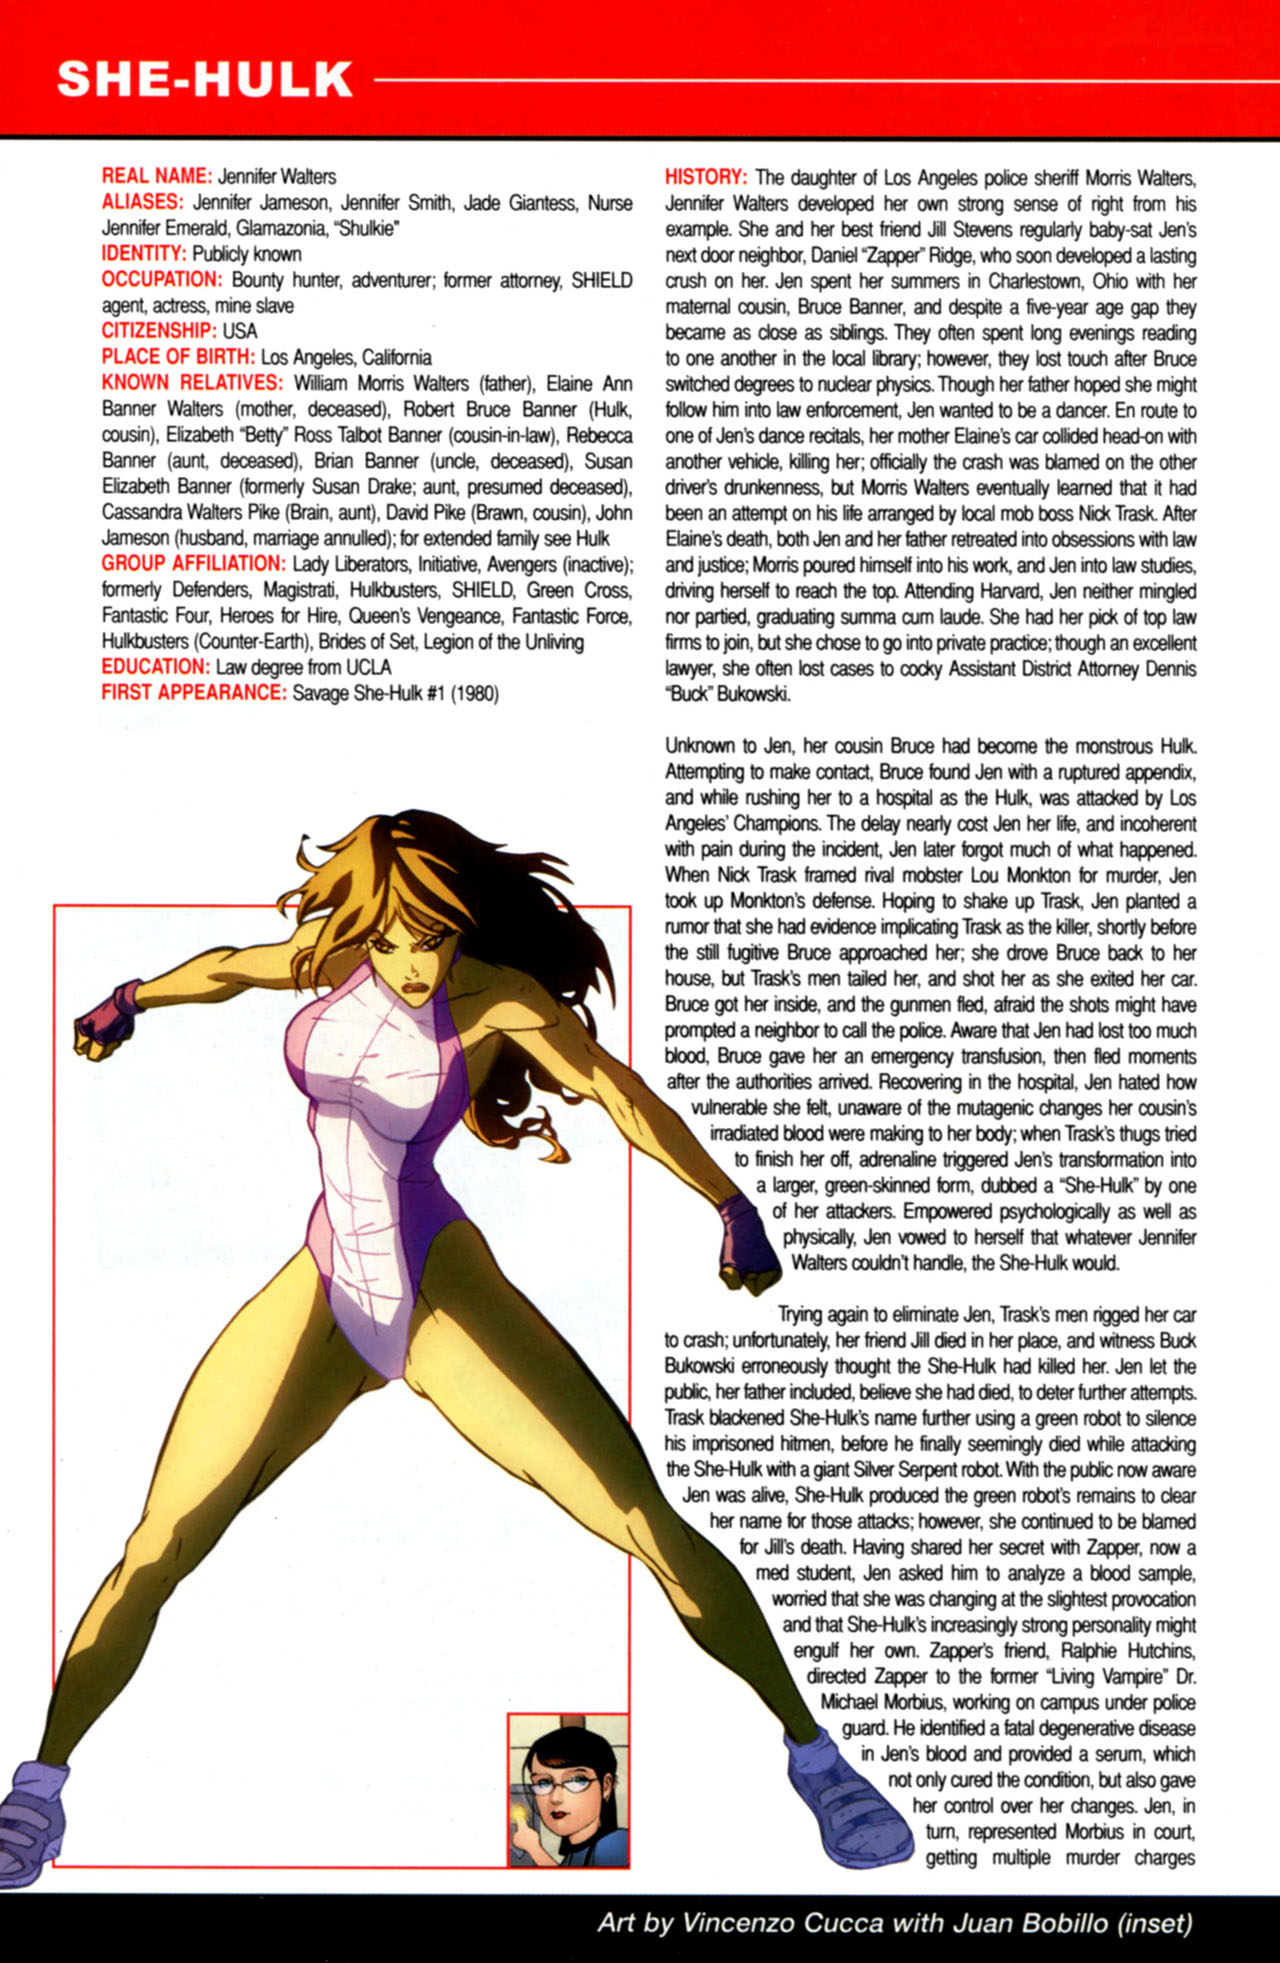 Read online She-Hulks comic -  Issue #1 - 24